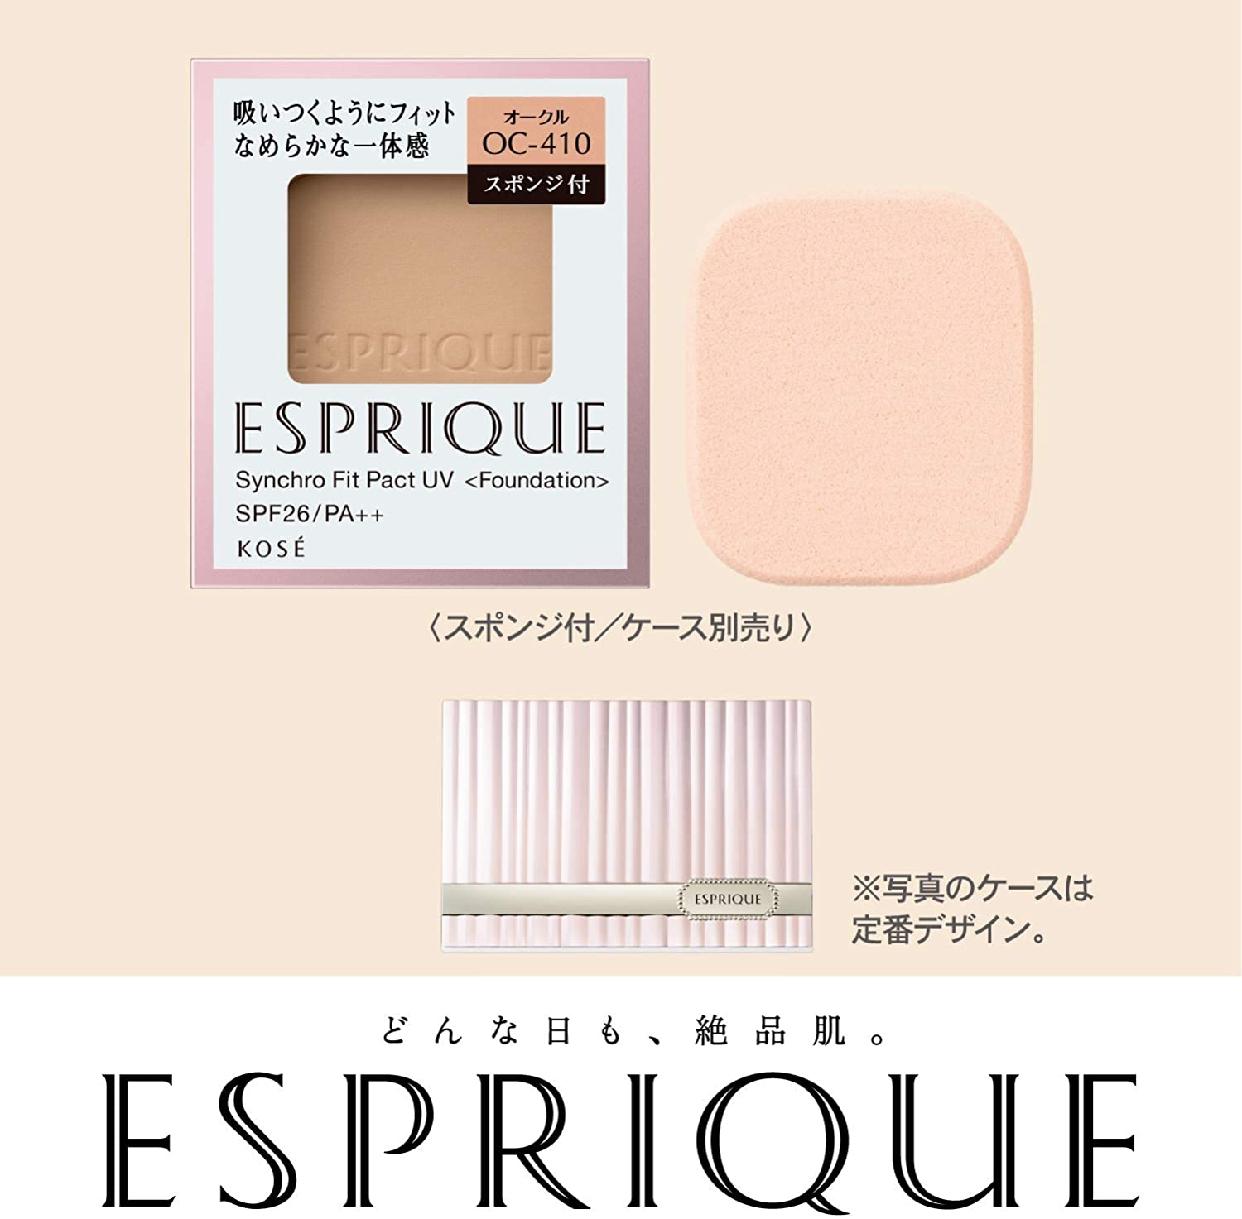 ESPRIQUE(エスプリーク) シンクロフィット パクト UVの商品画像8